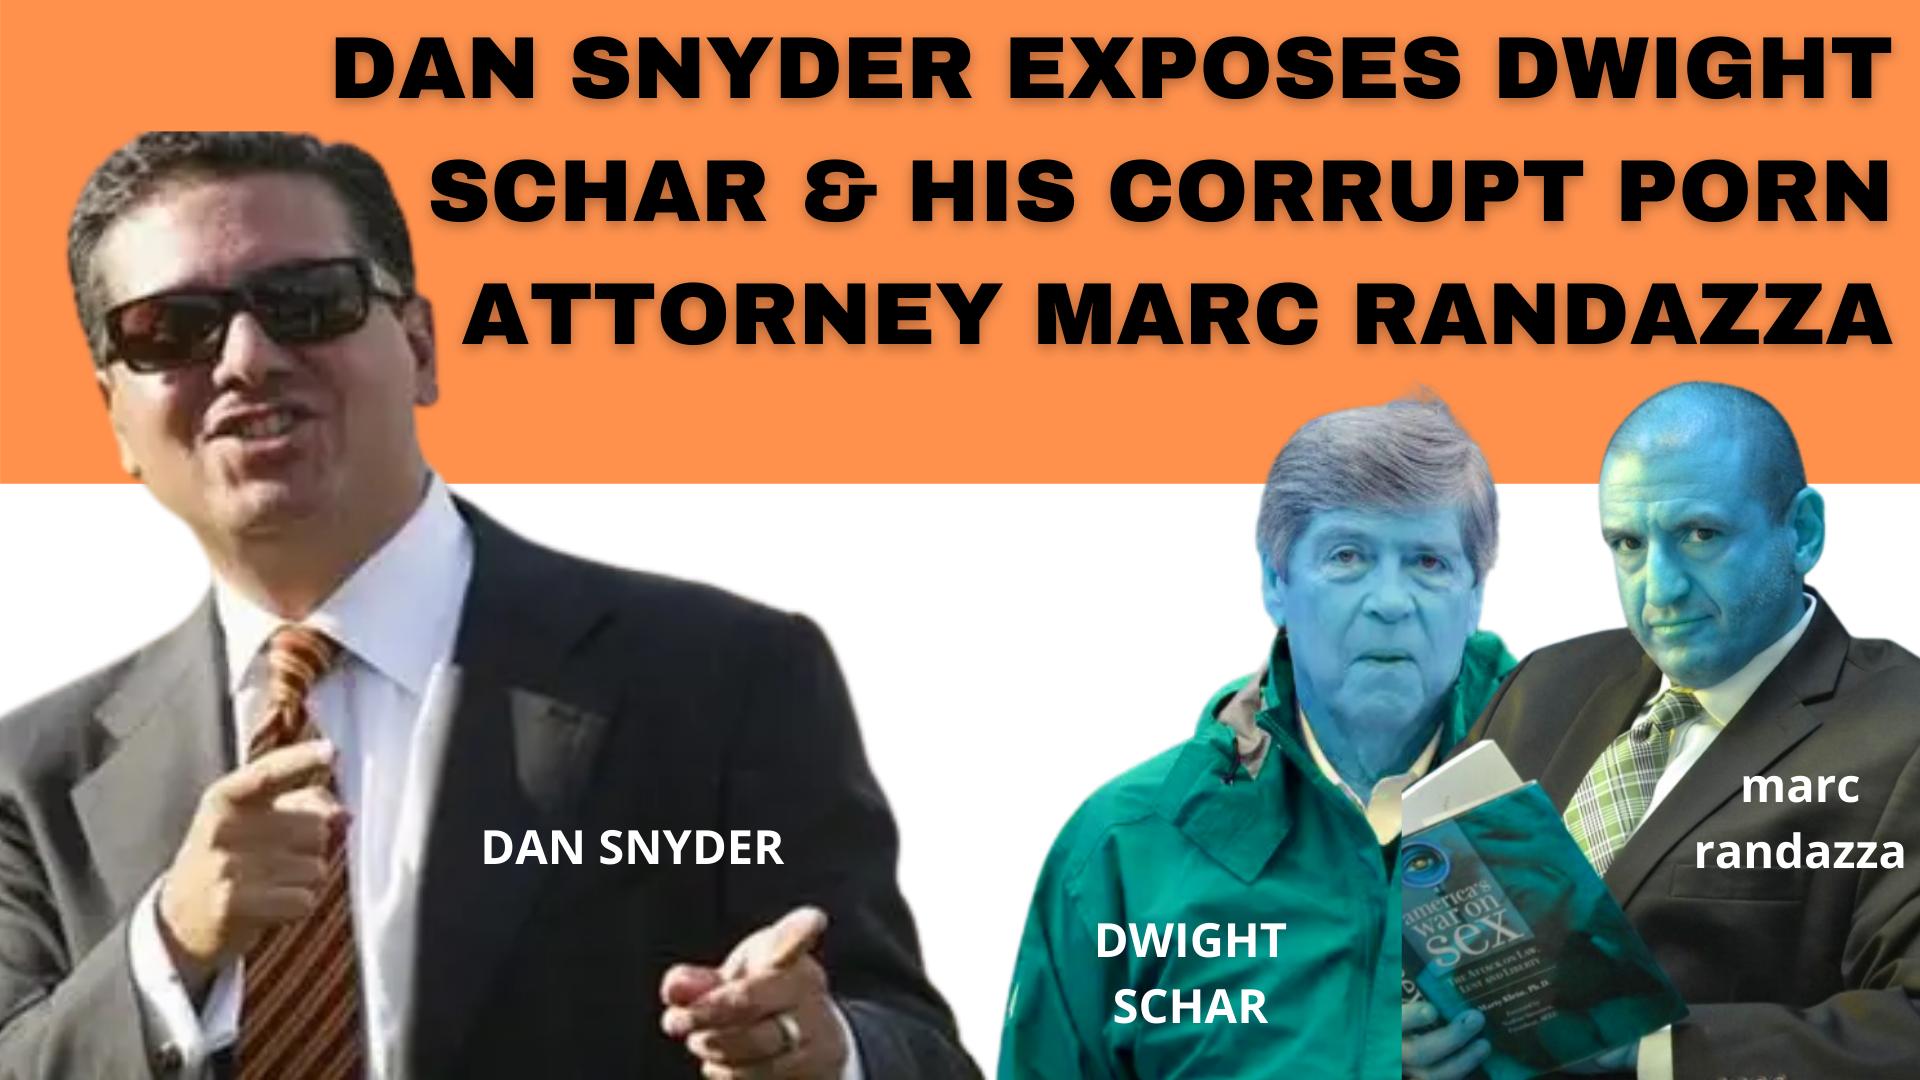 Dan Snyder, Don Juravin and Richard Arrighi EXPOSE Dwight Schar and his porn corrupt attonrey Marc Randazza